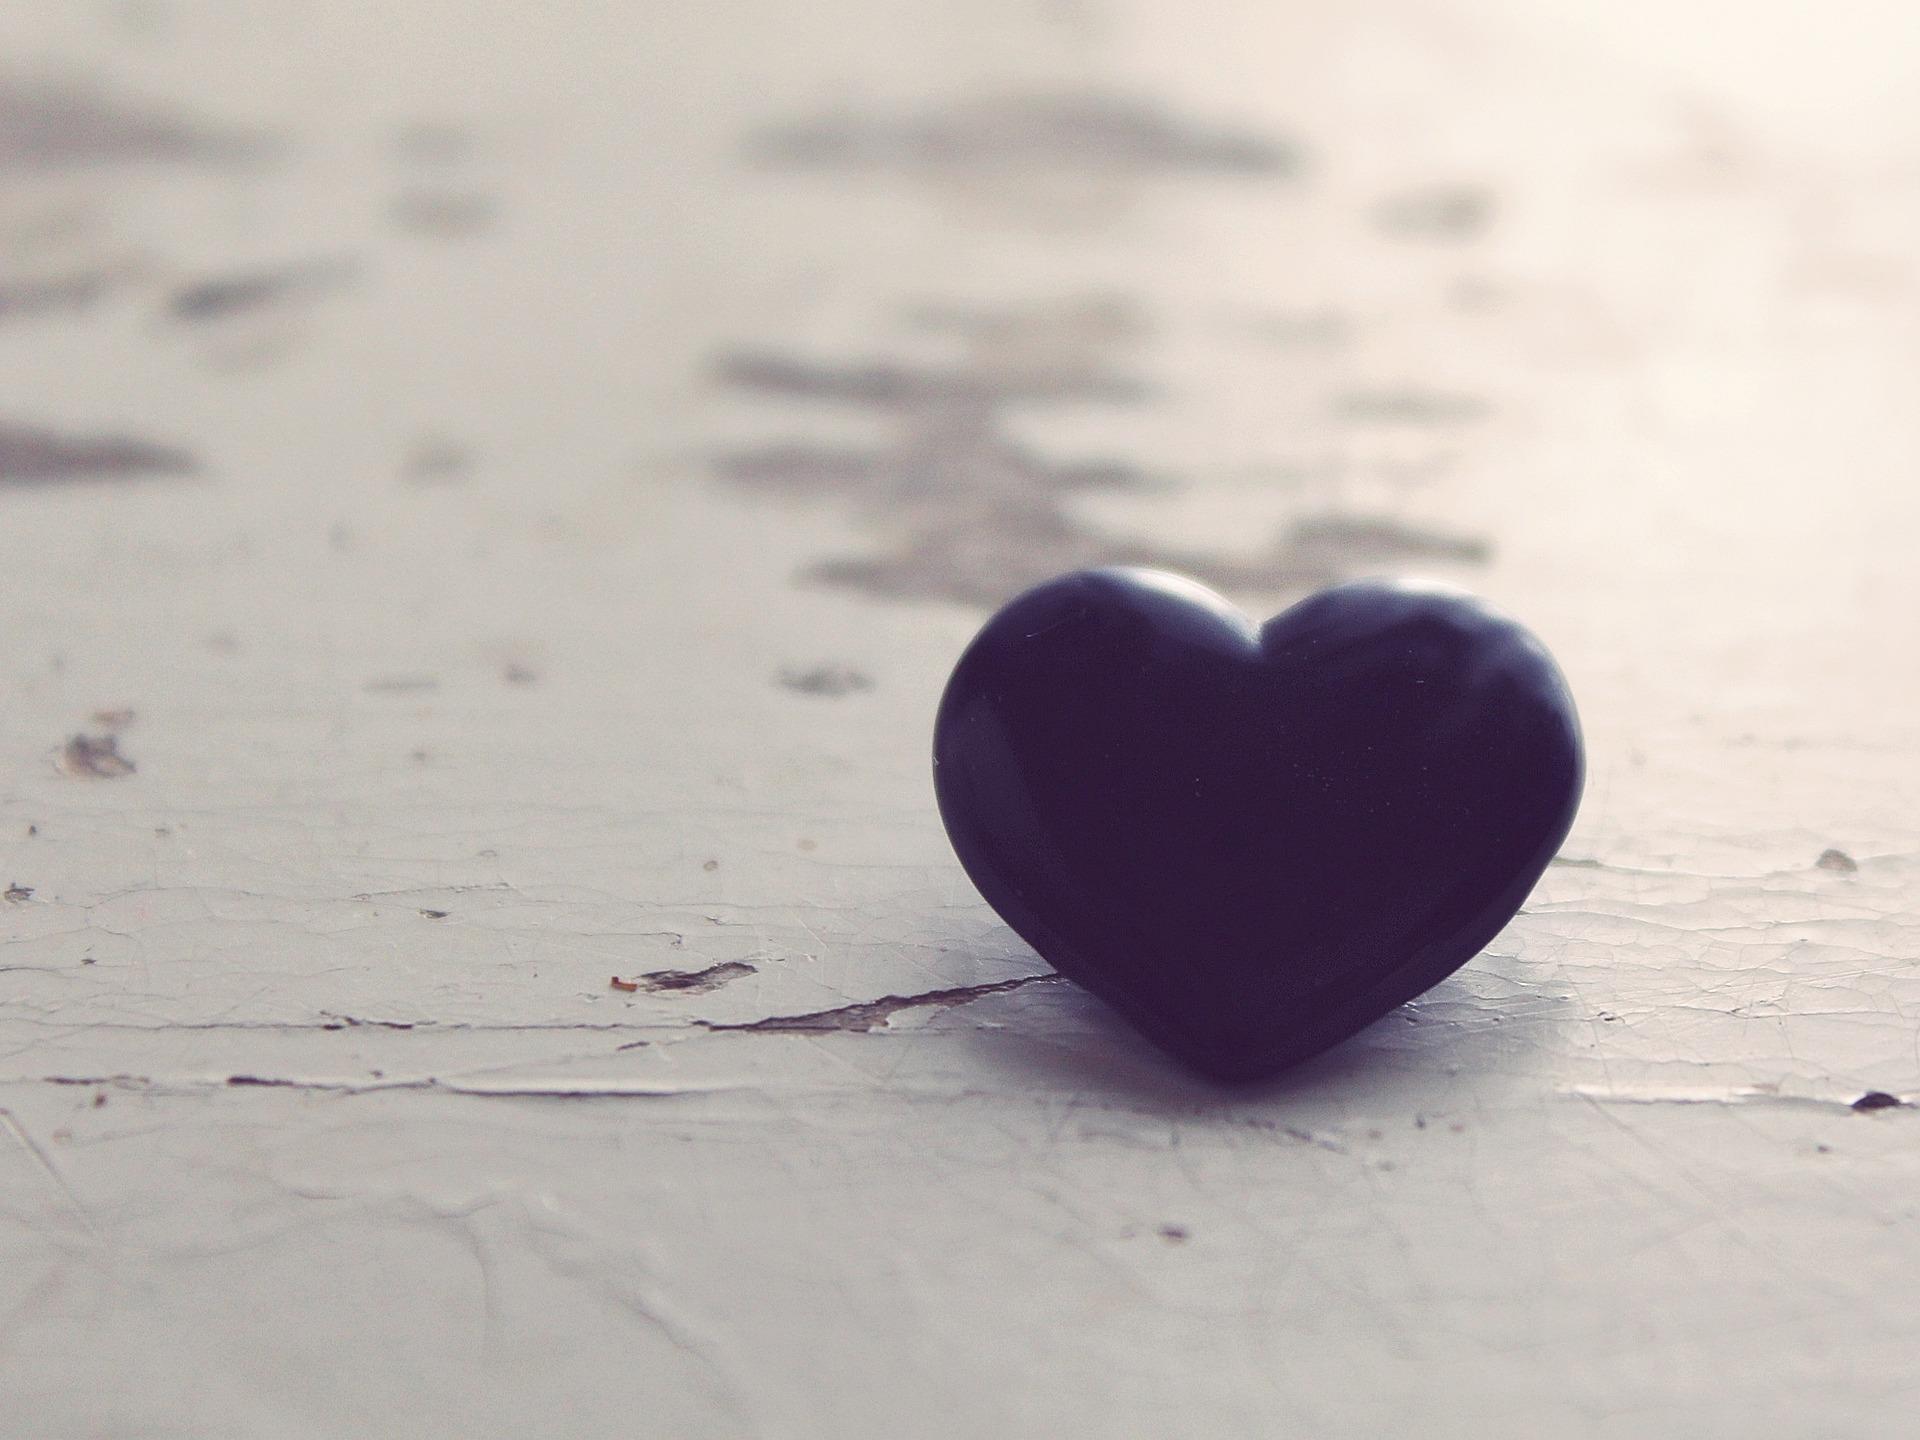 heart-771011_1920